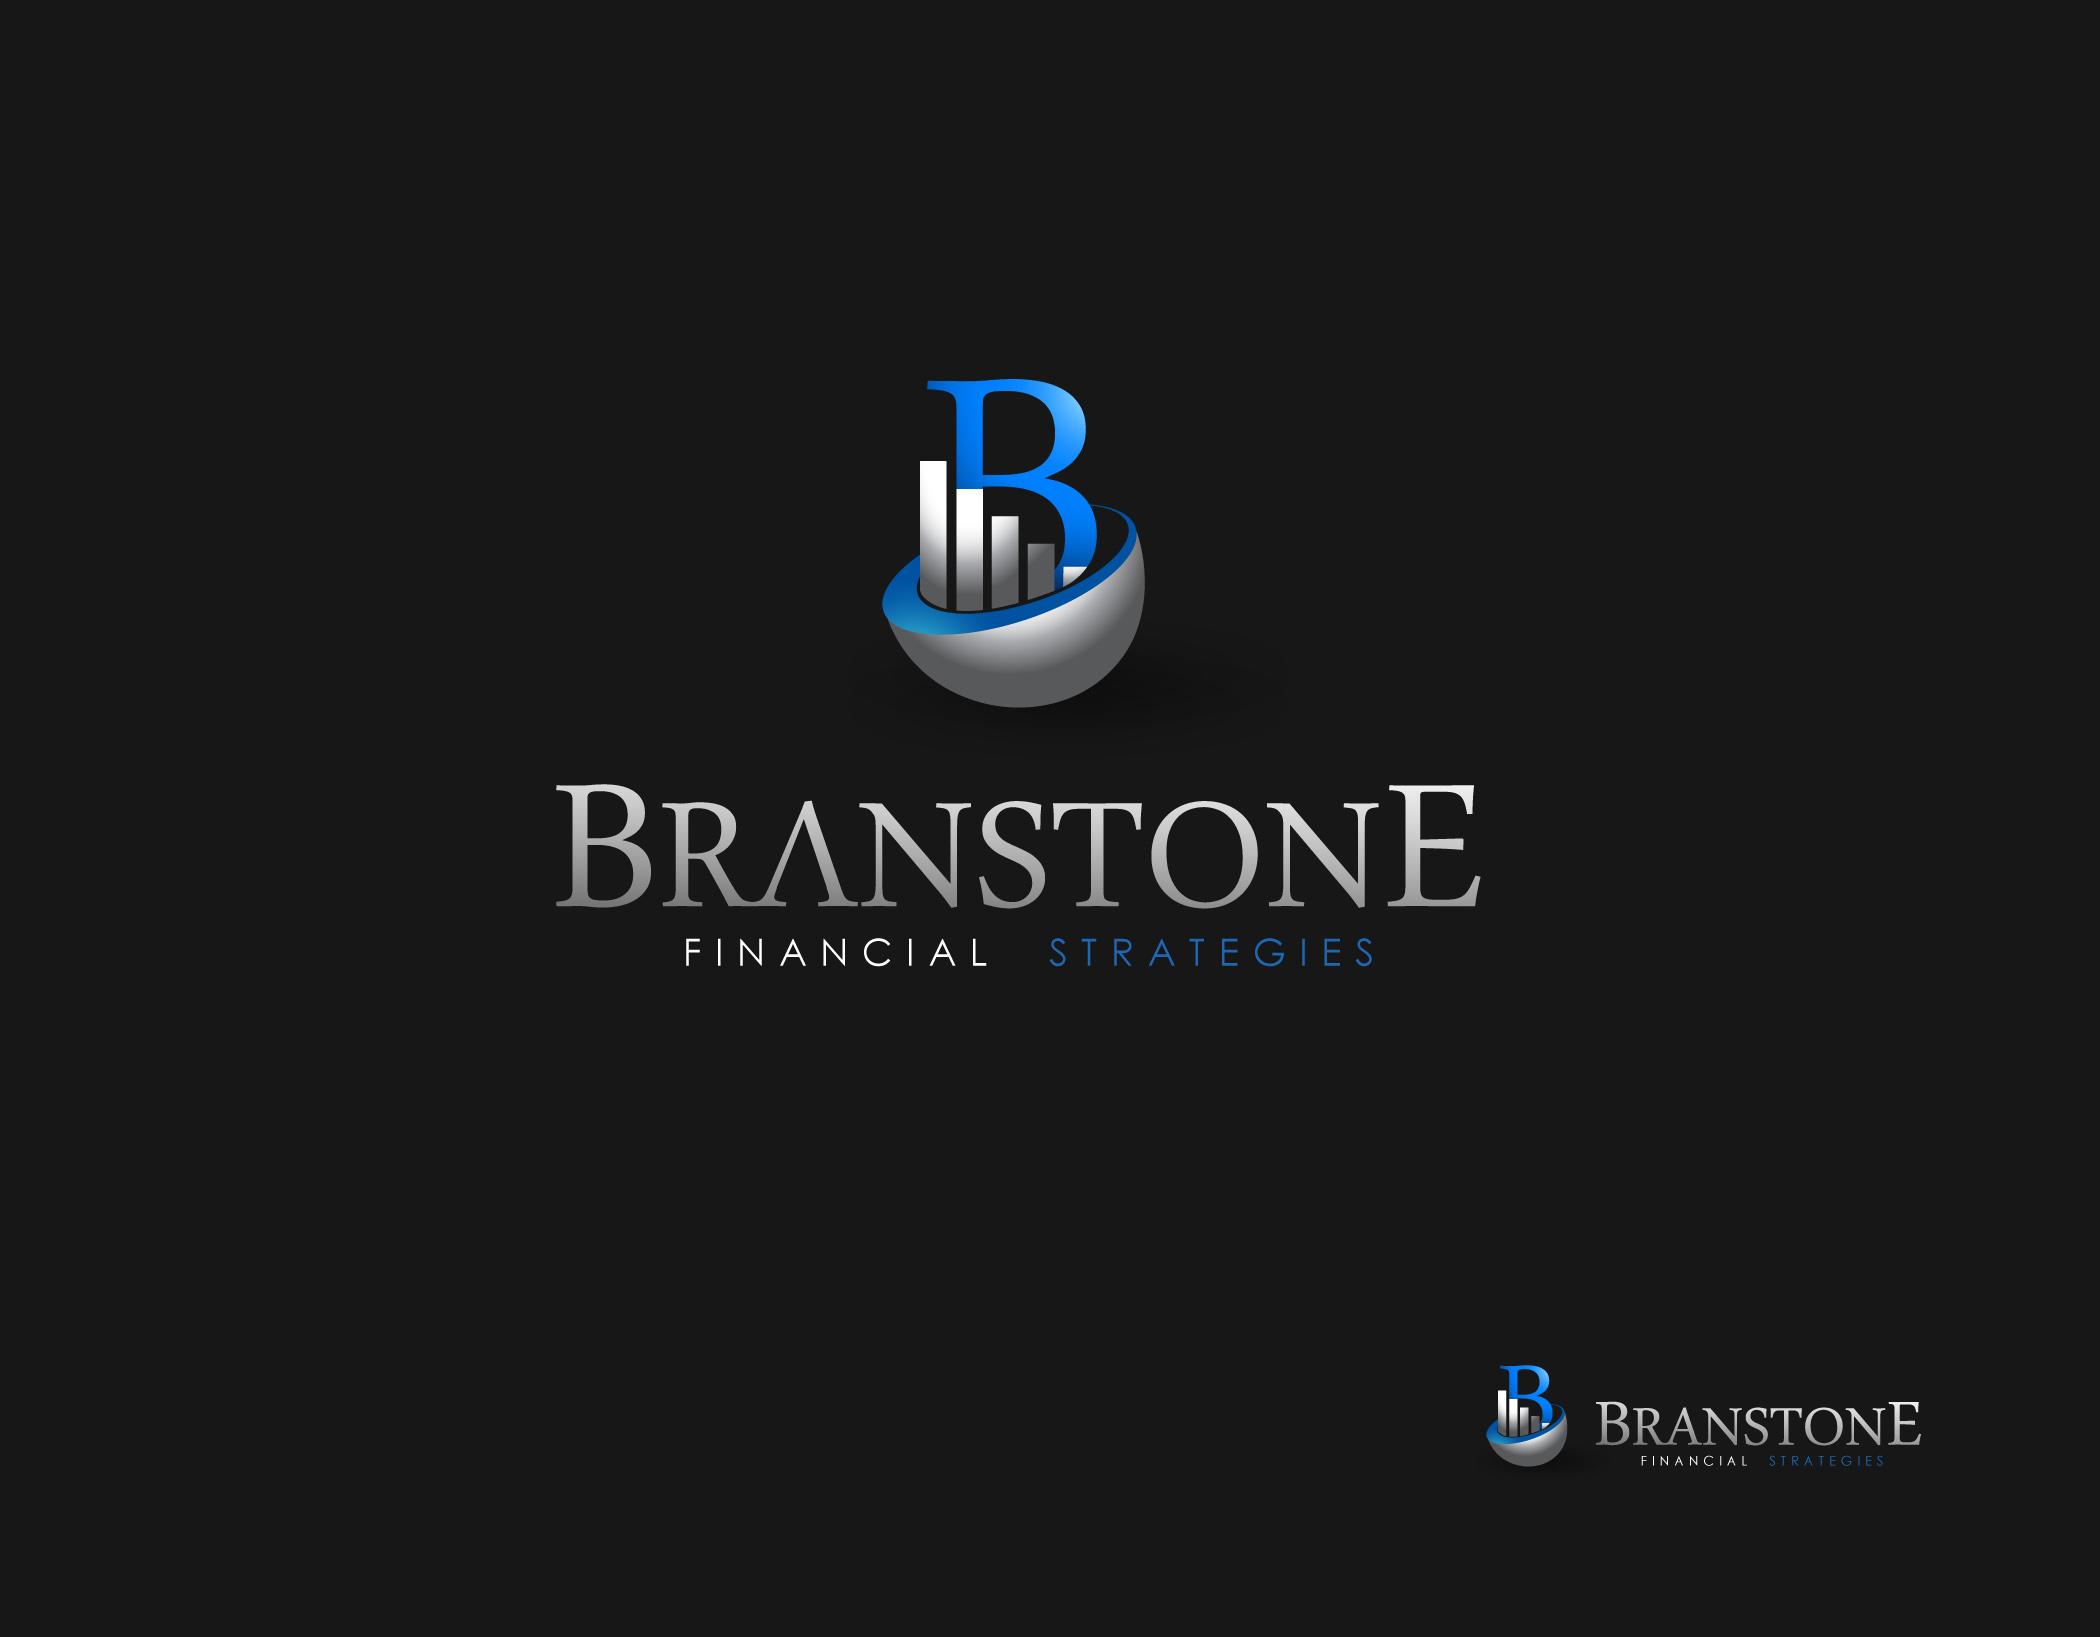 Logo Design by Mark Anthony Moreto Jordan - Entry No. 269 in the Logo Design Contest Inspiring Logo Design for Branstone Financial Strategies.